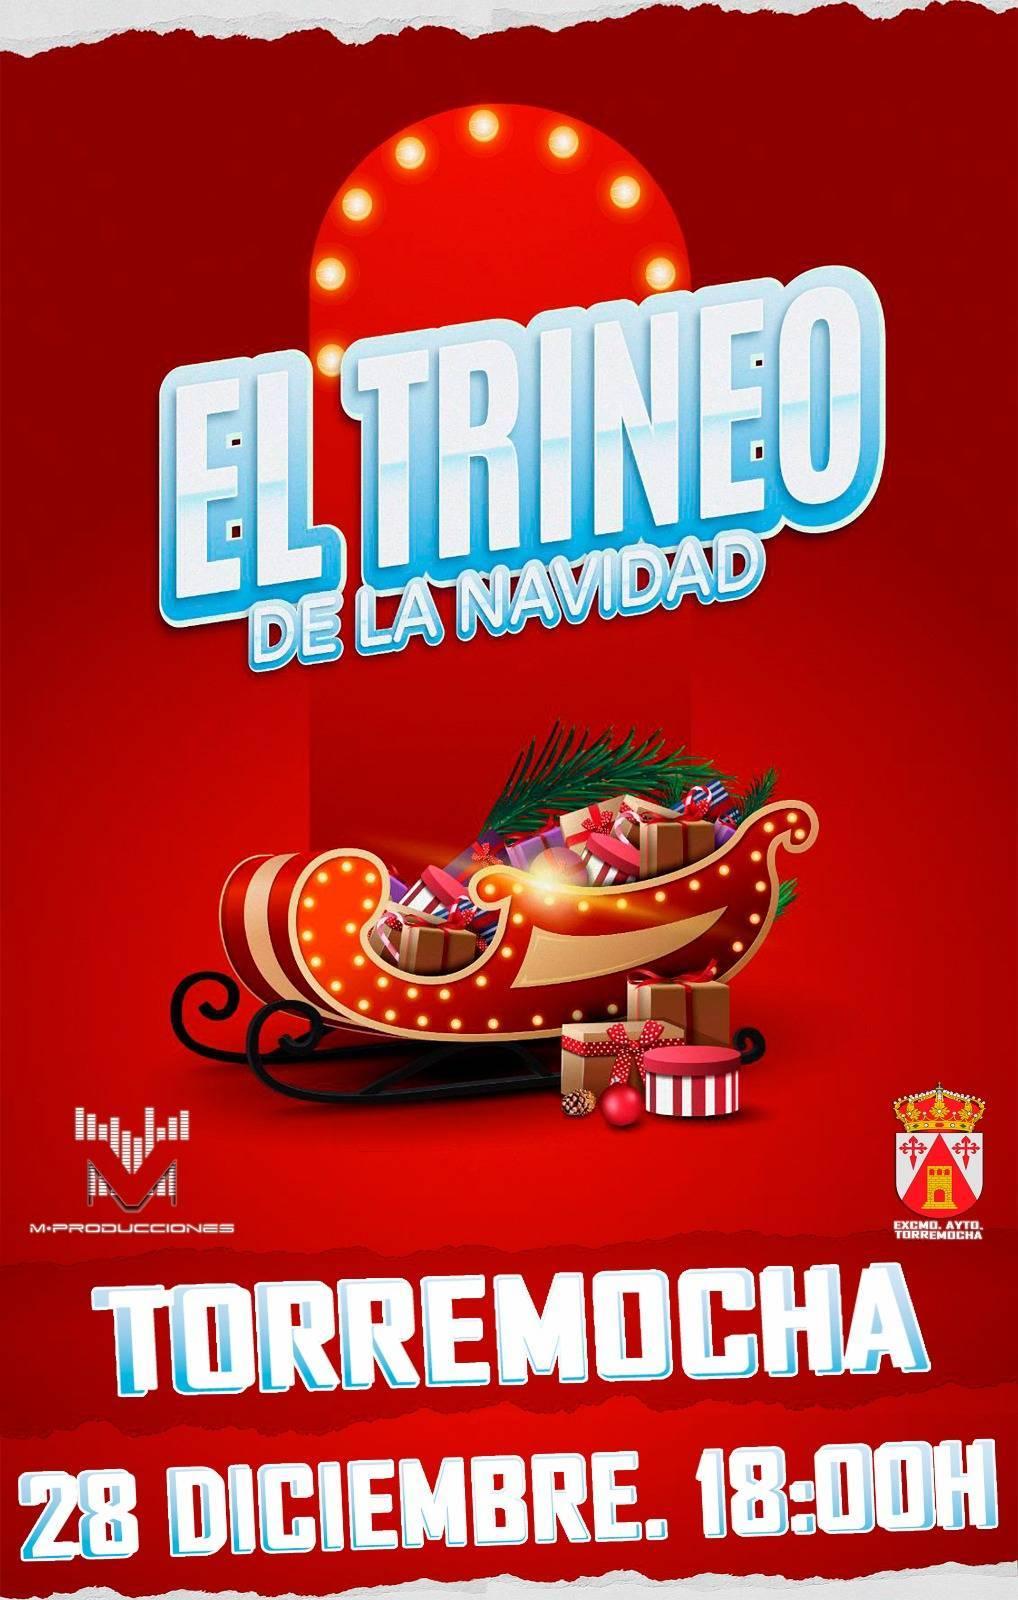 El trineo de la Navidad (2020) - Torremocha (Cáceres)